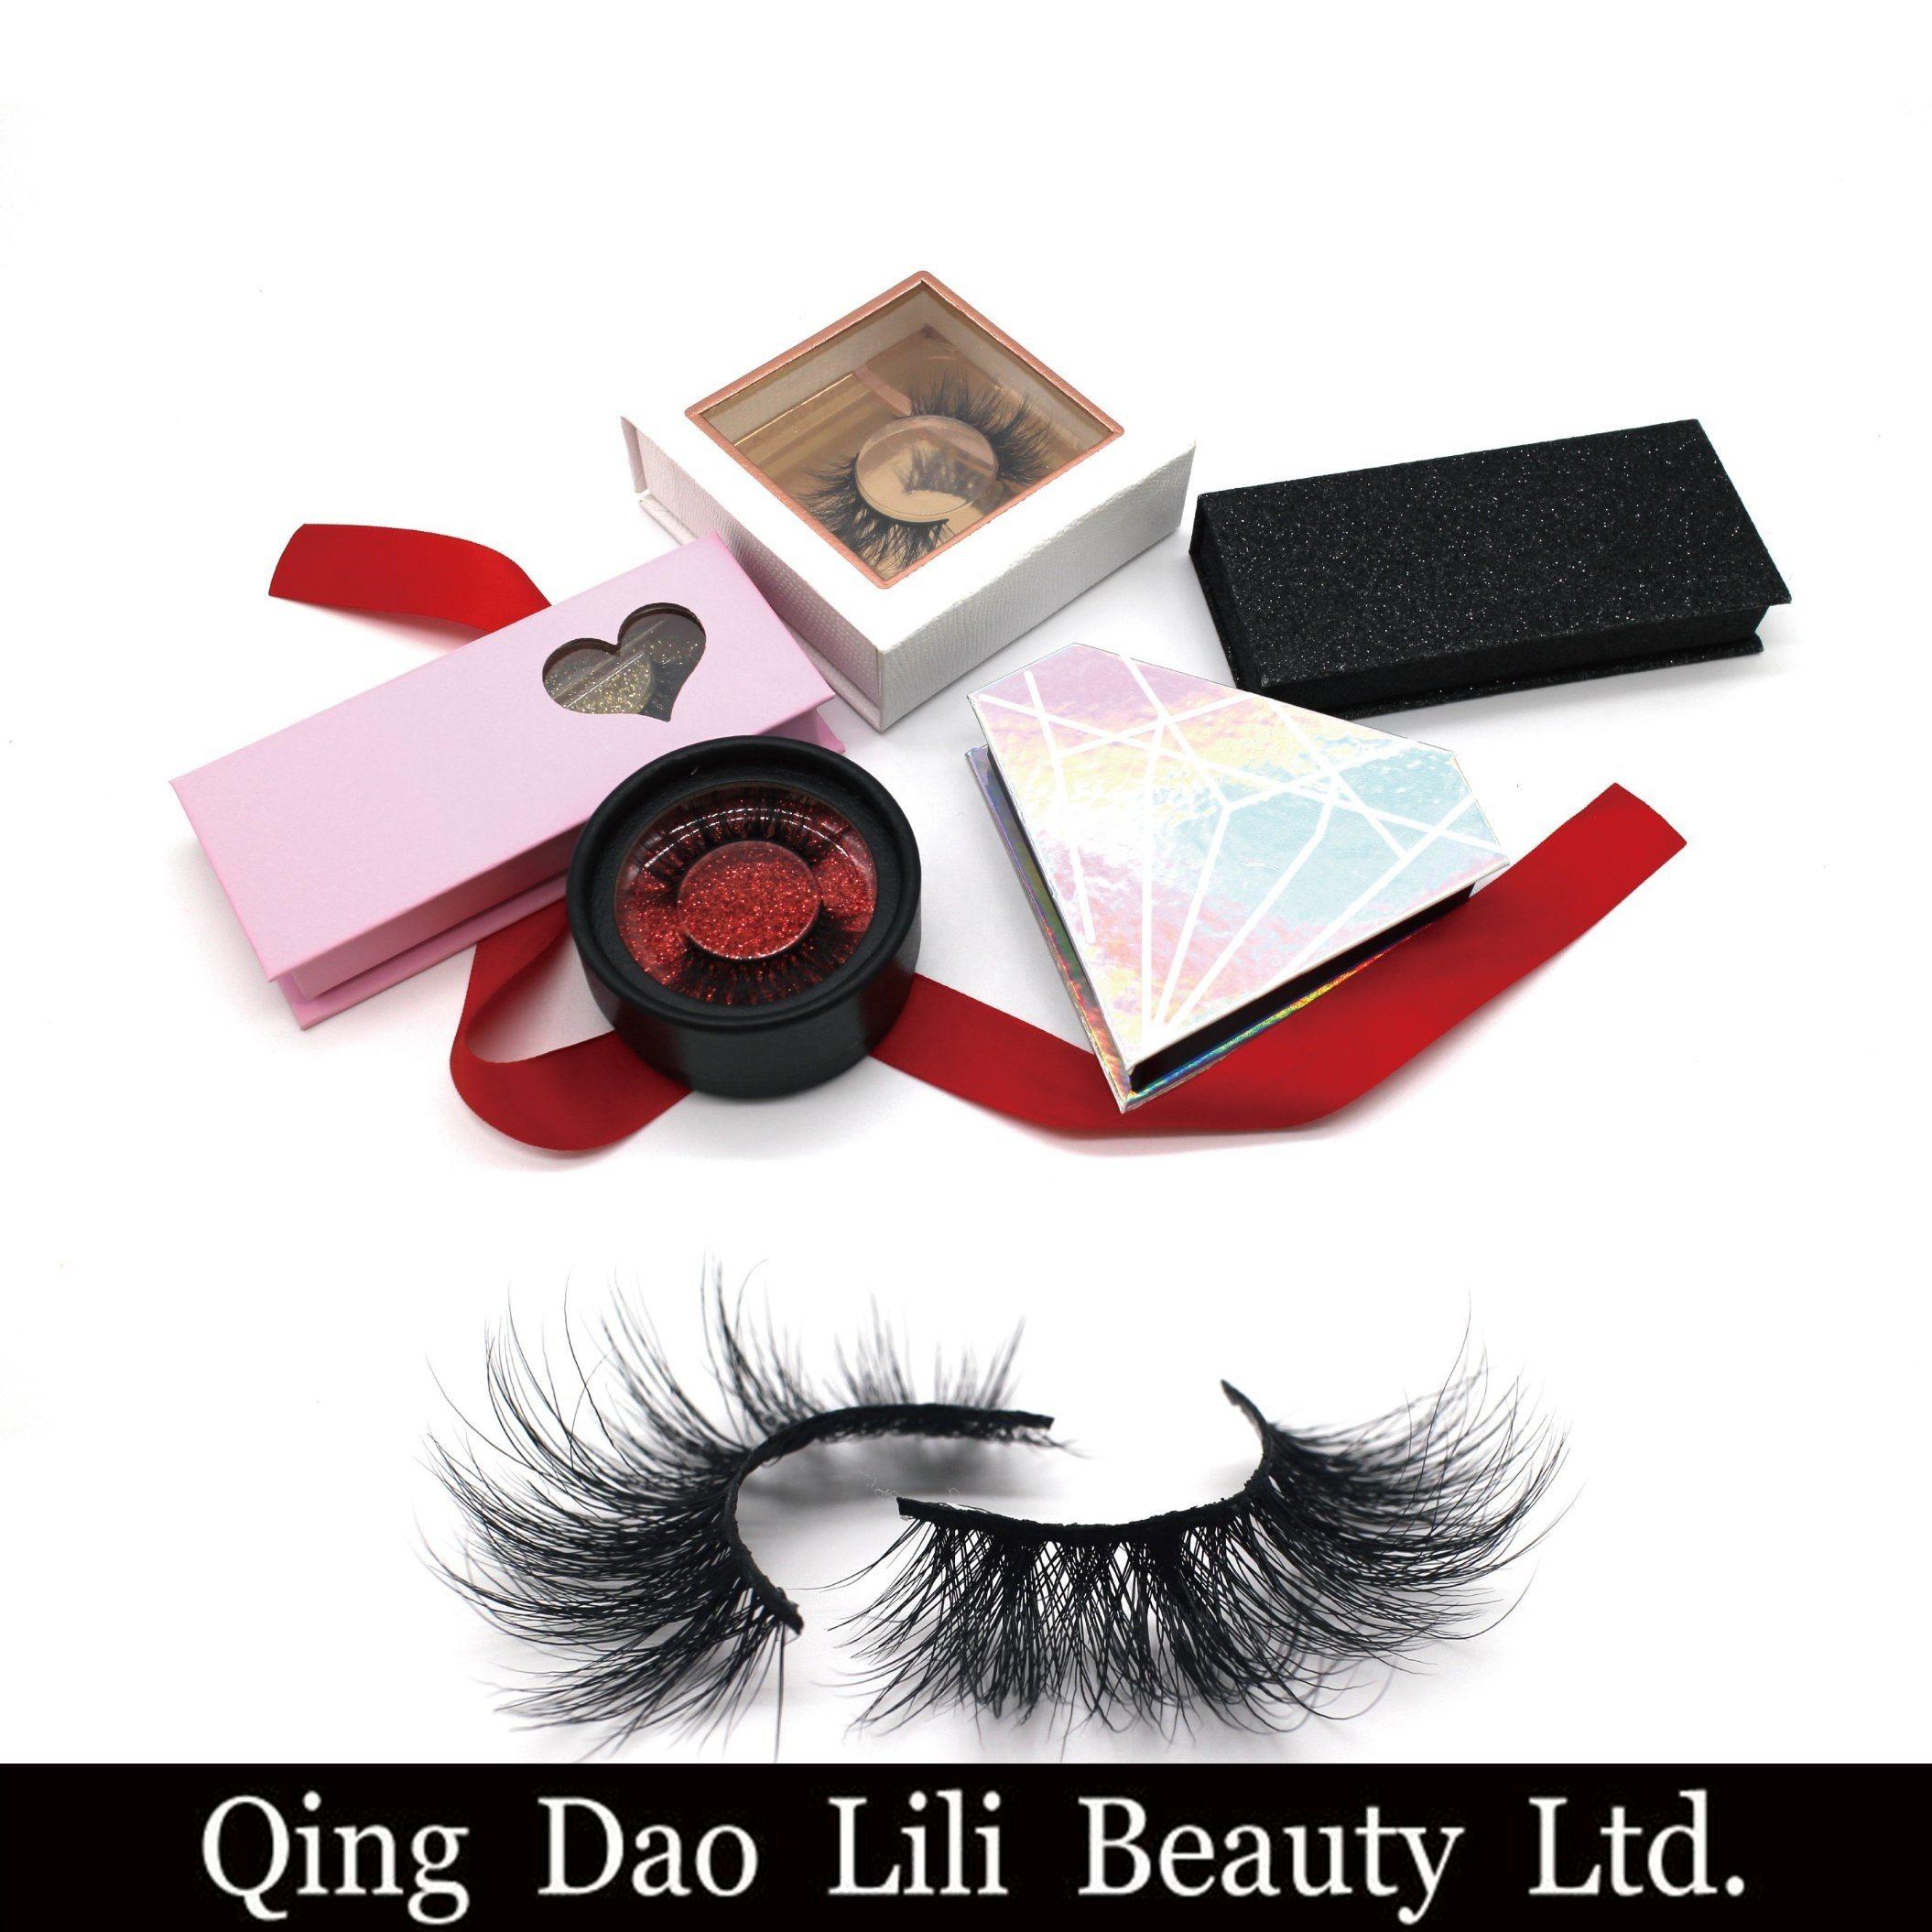 da5f64c476e Eyelash Price, 2019 Eyelash Price Manufacturers & Suppliers    Made-in-China.com